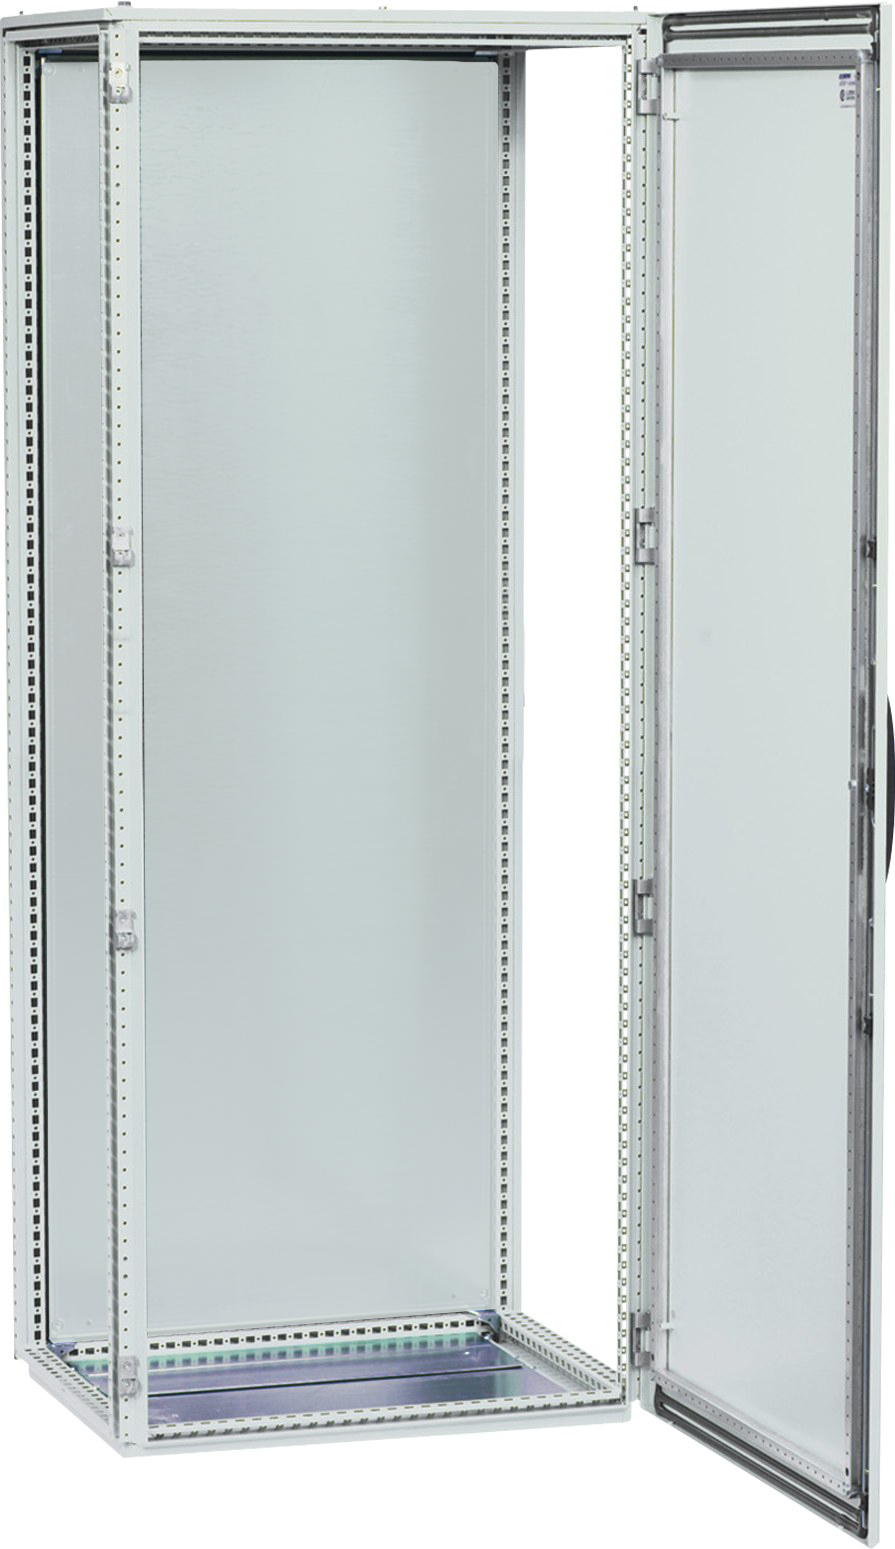 1 Stk Anreihschrank 1-türig, 2000x400x400mm, RAL 7035 AS204041-5